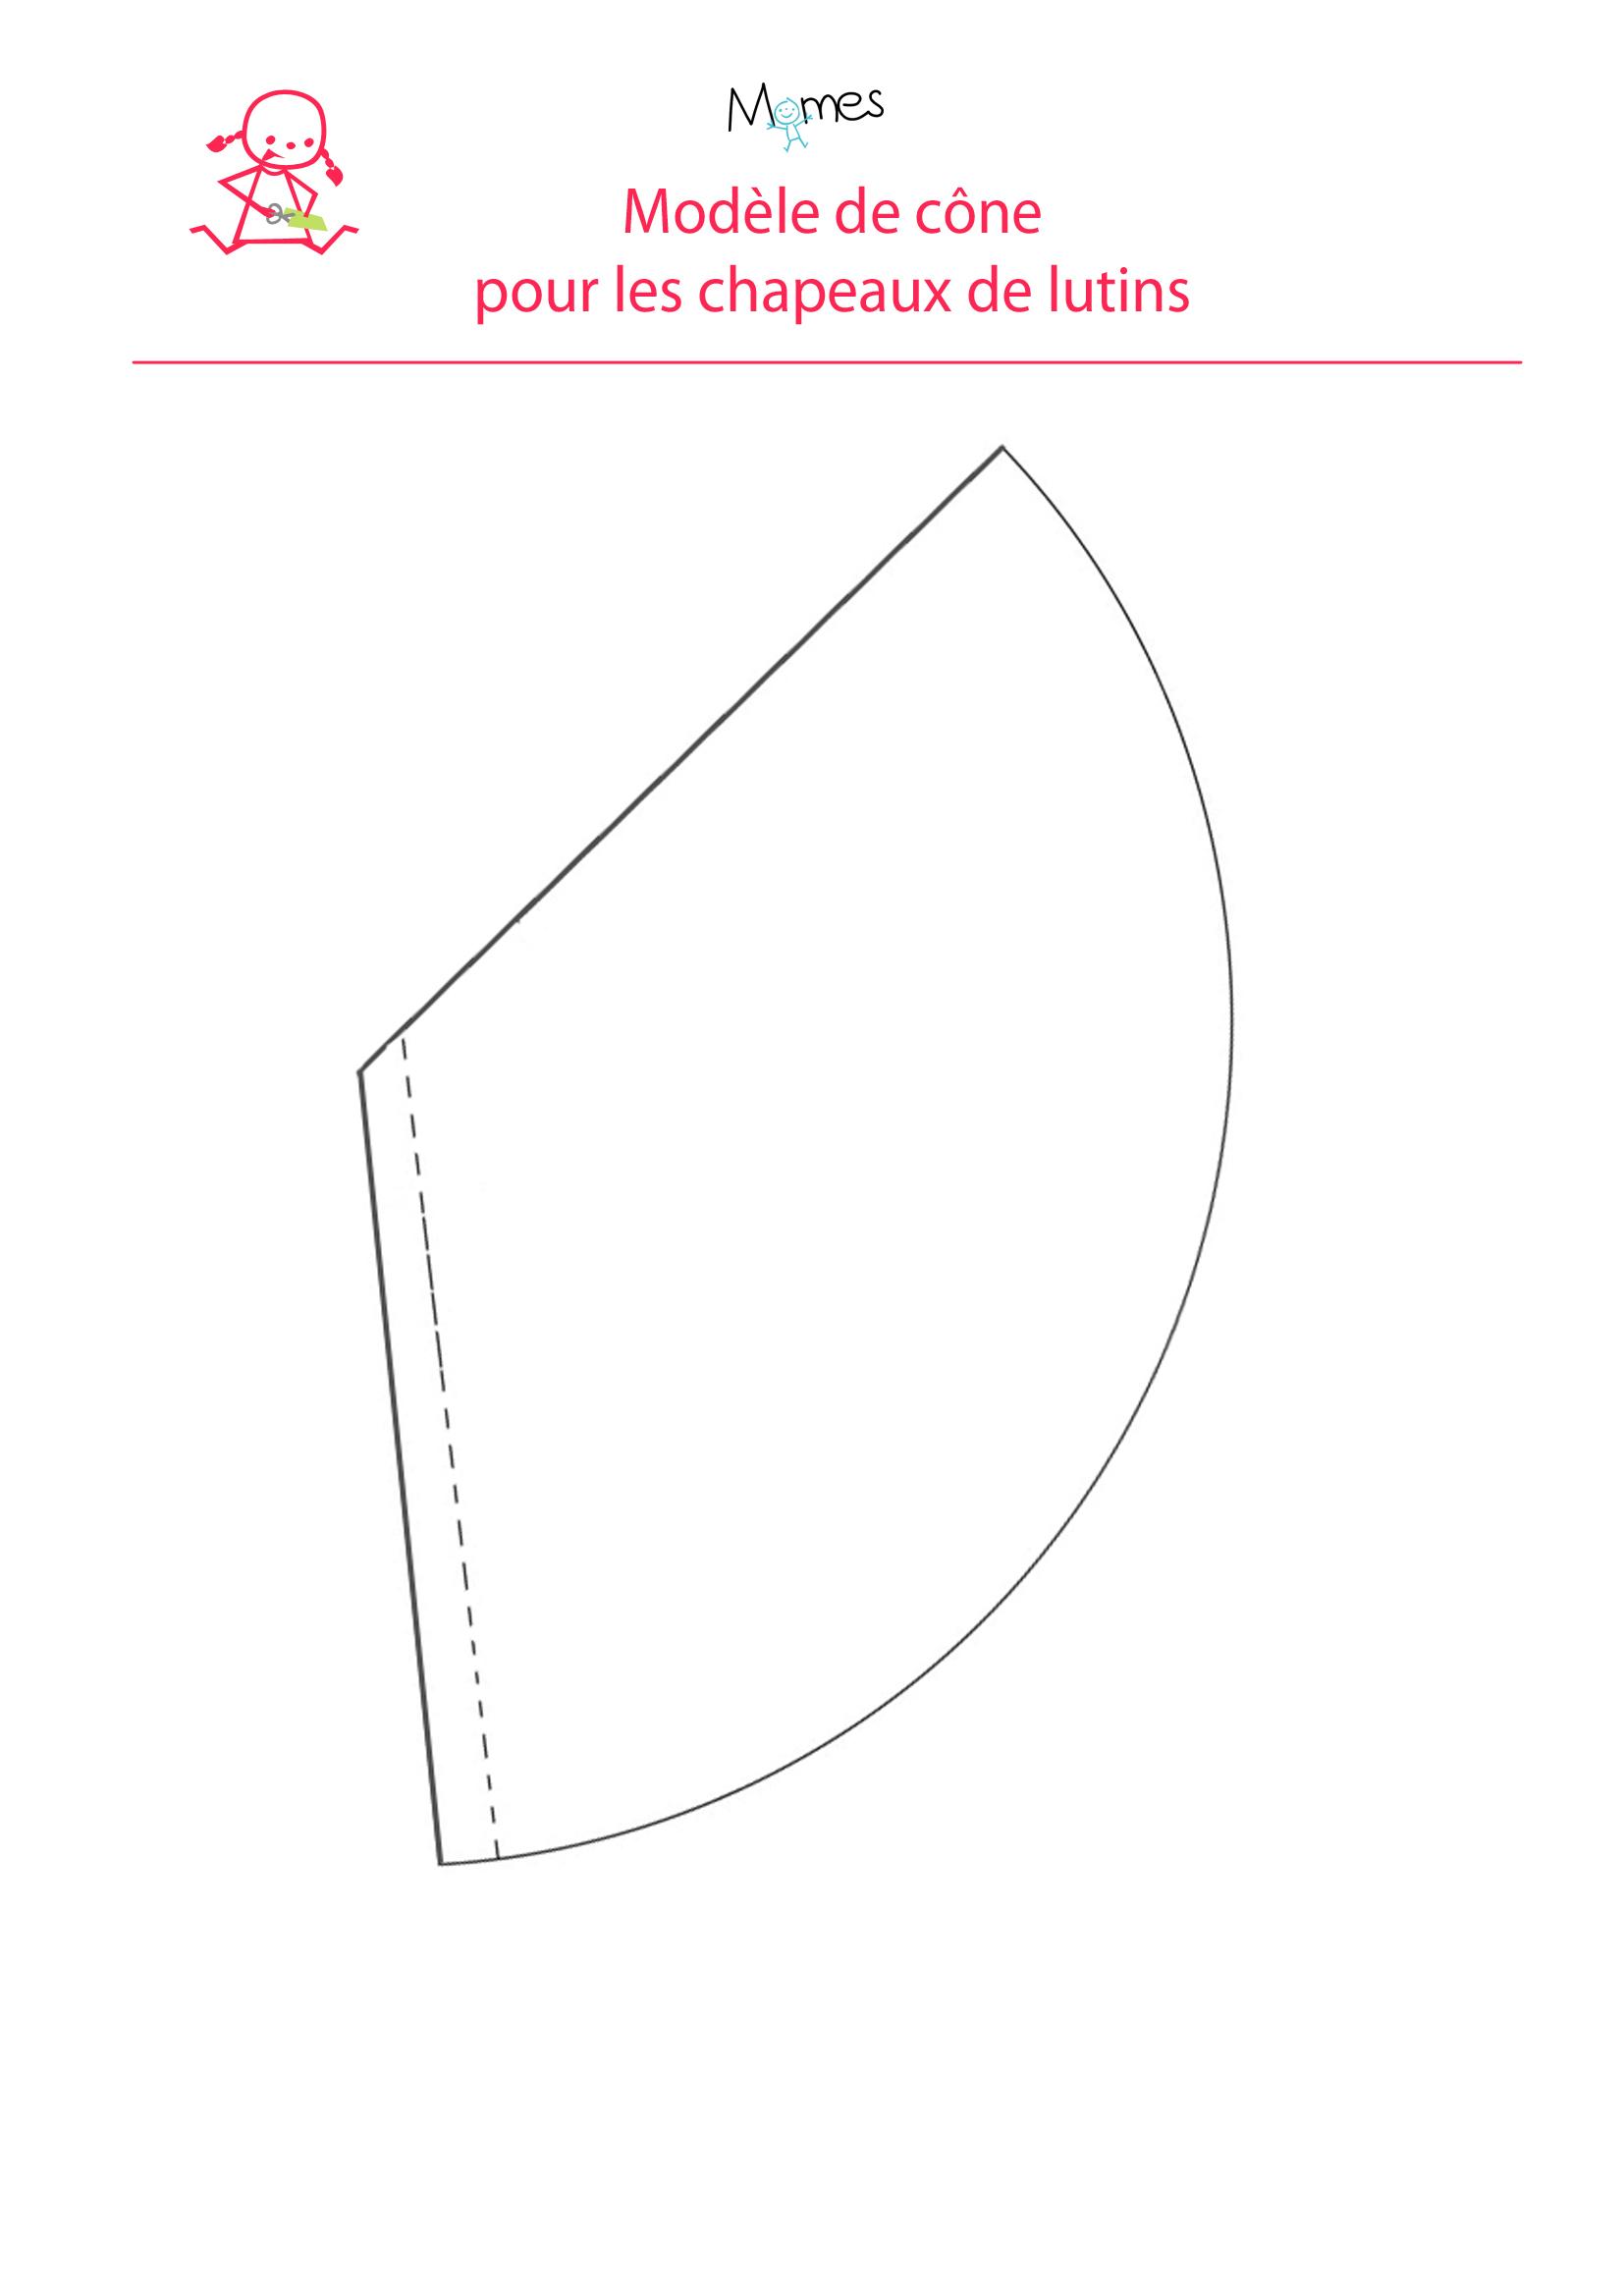 gabarit de cone à imprimer